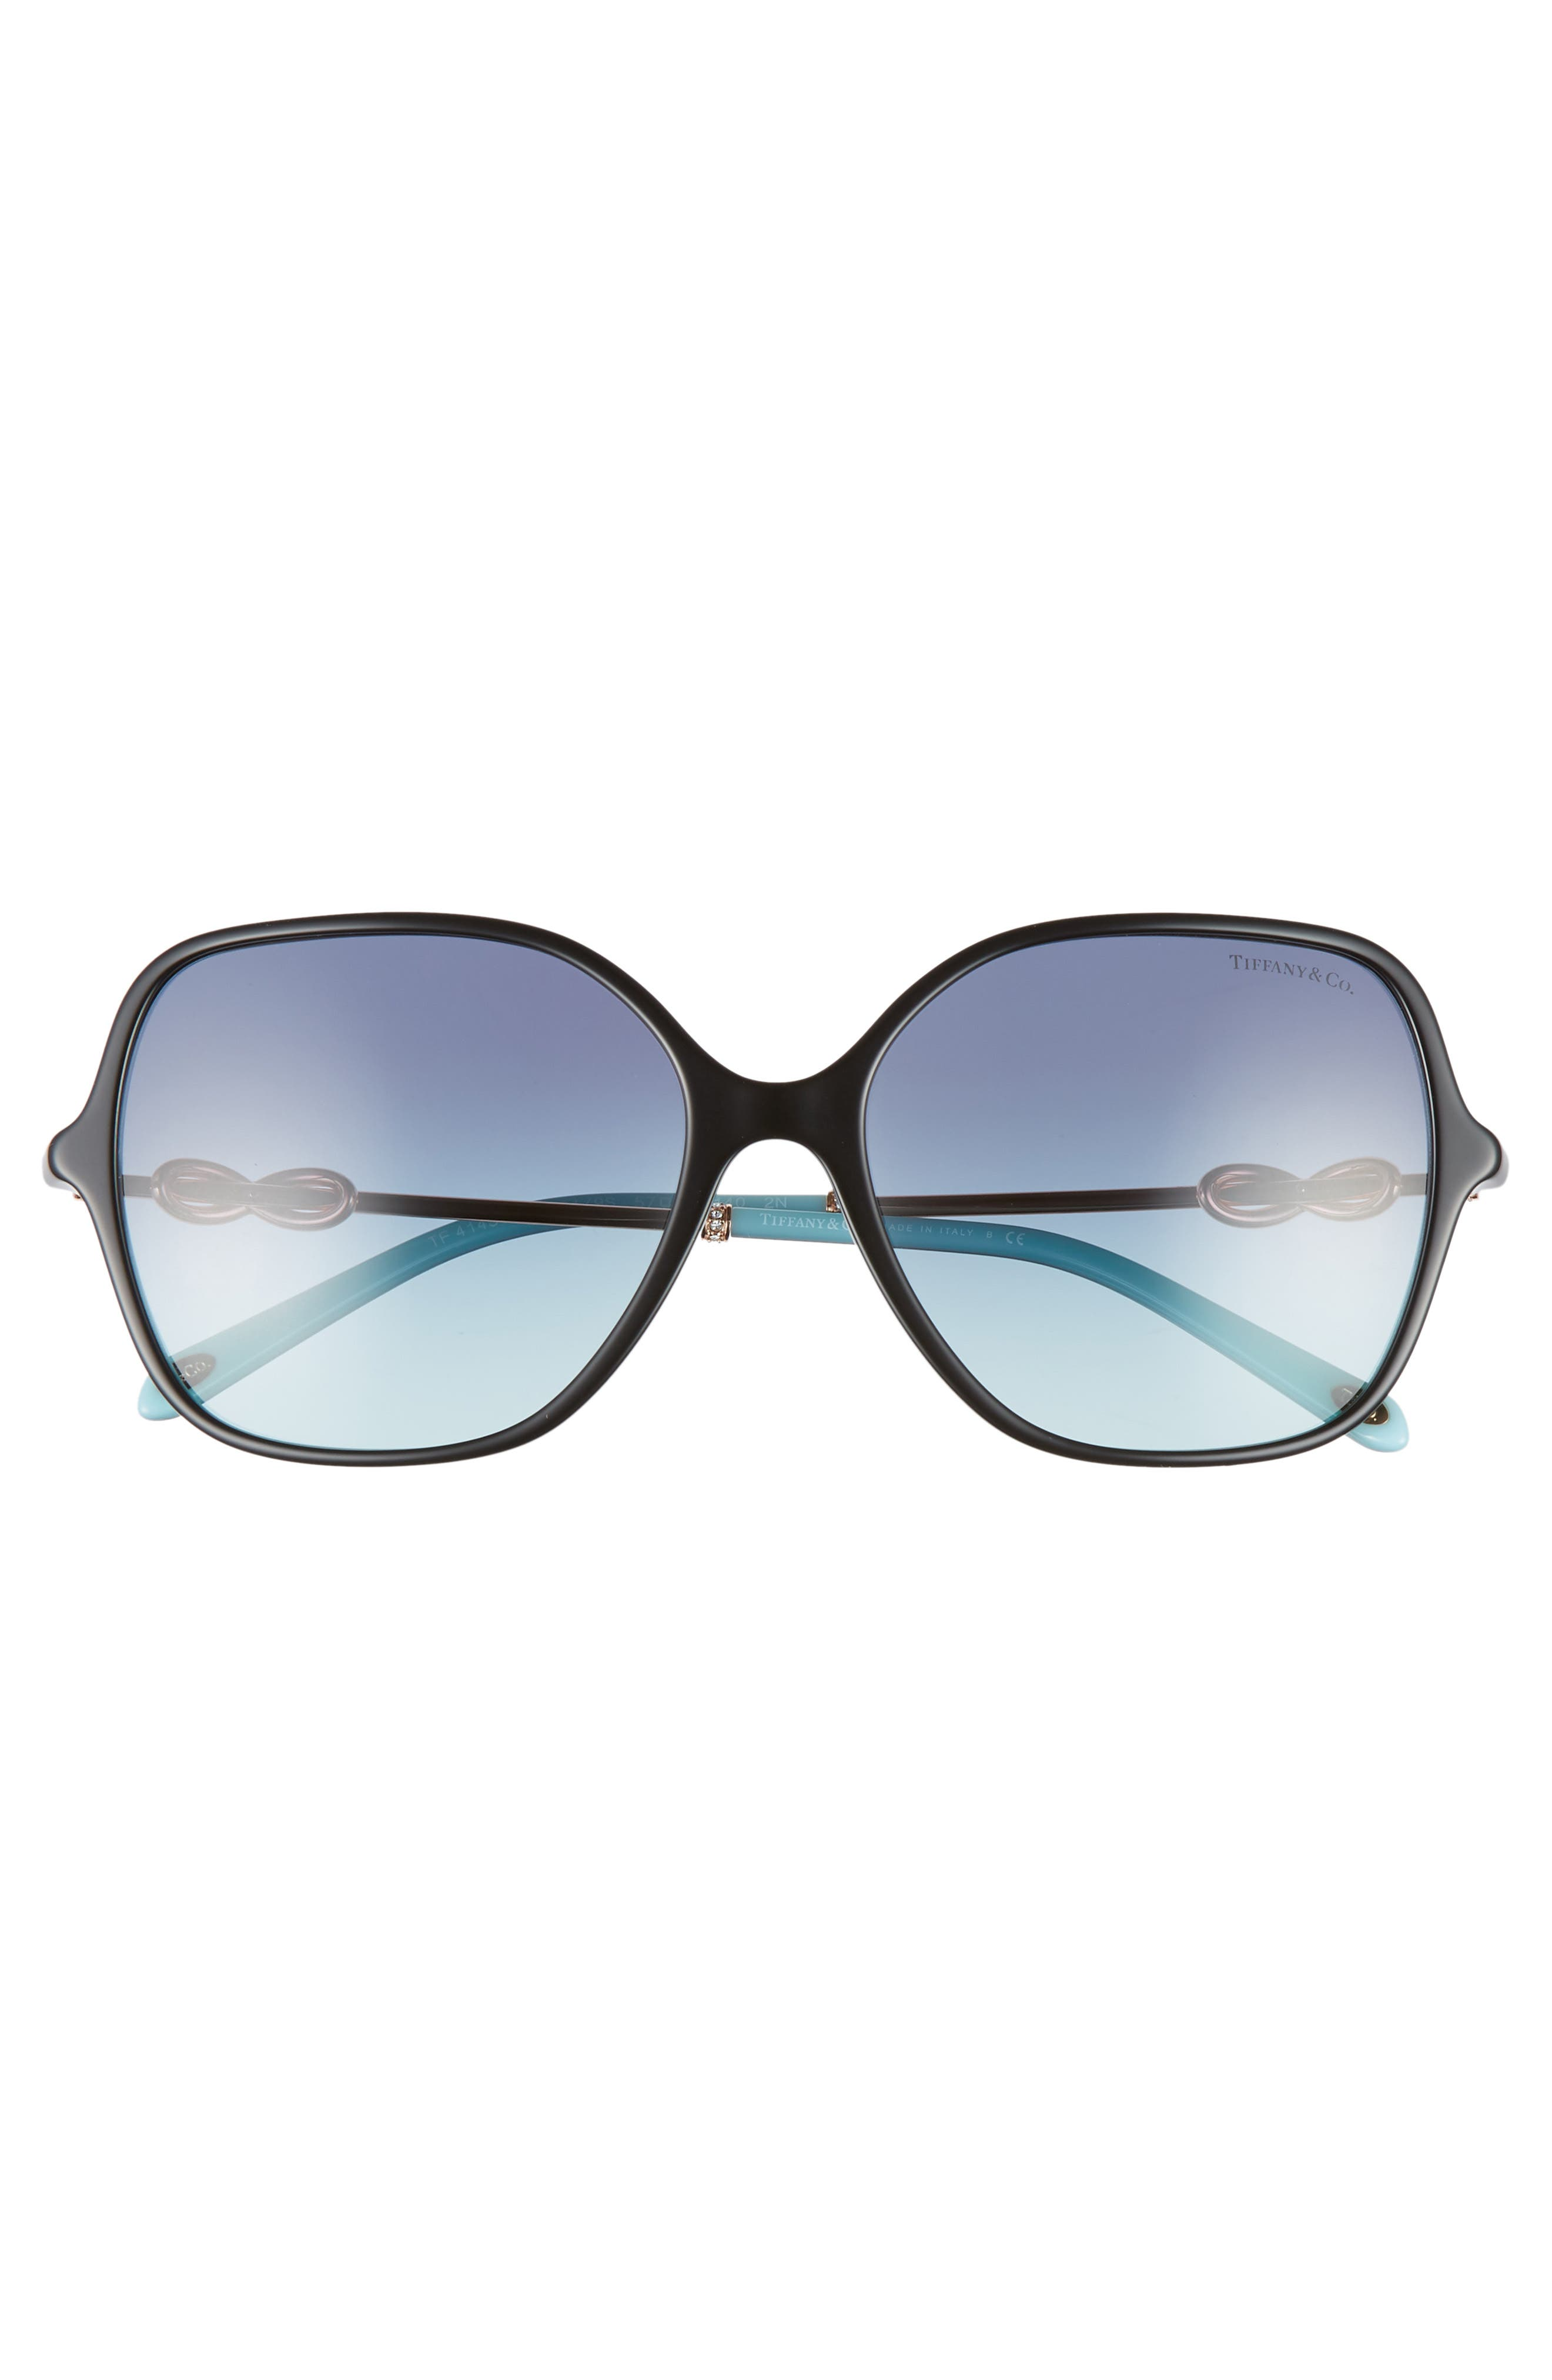 TIFFANY & CO., Tiffany 57mm Sunglasses, Alternate thumbnail 3, color, BLACK/ AZURE GRADIENT